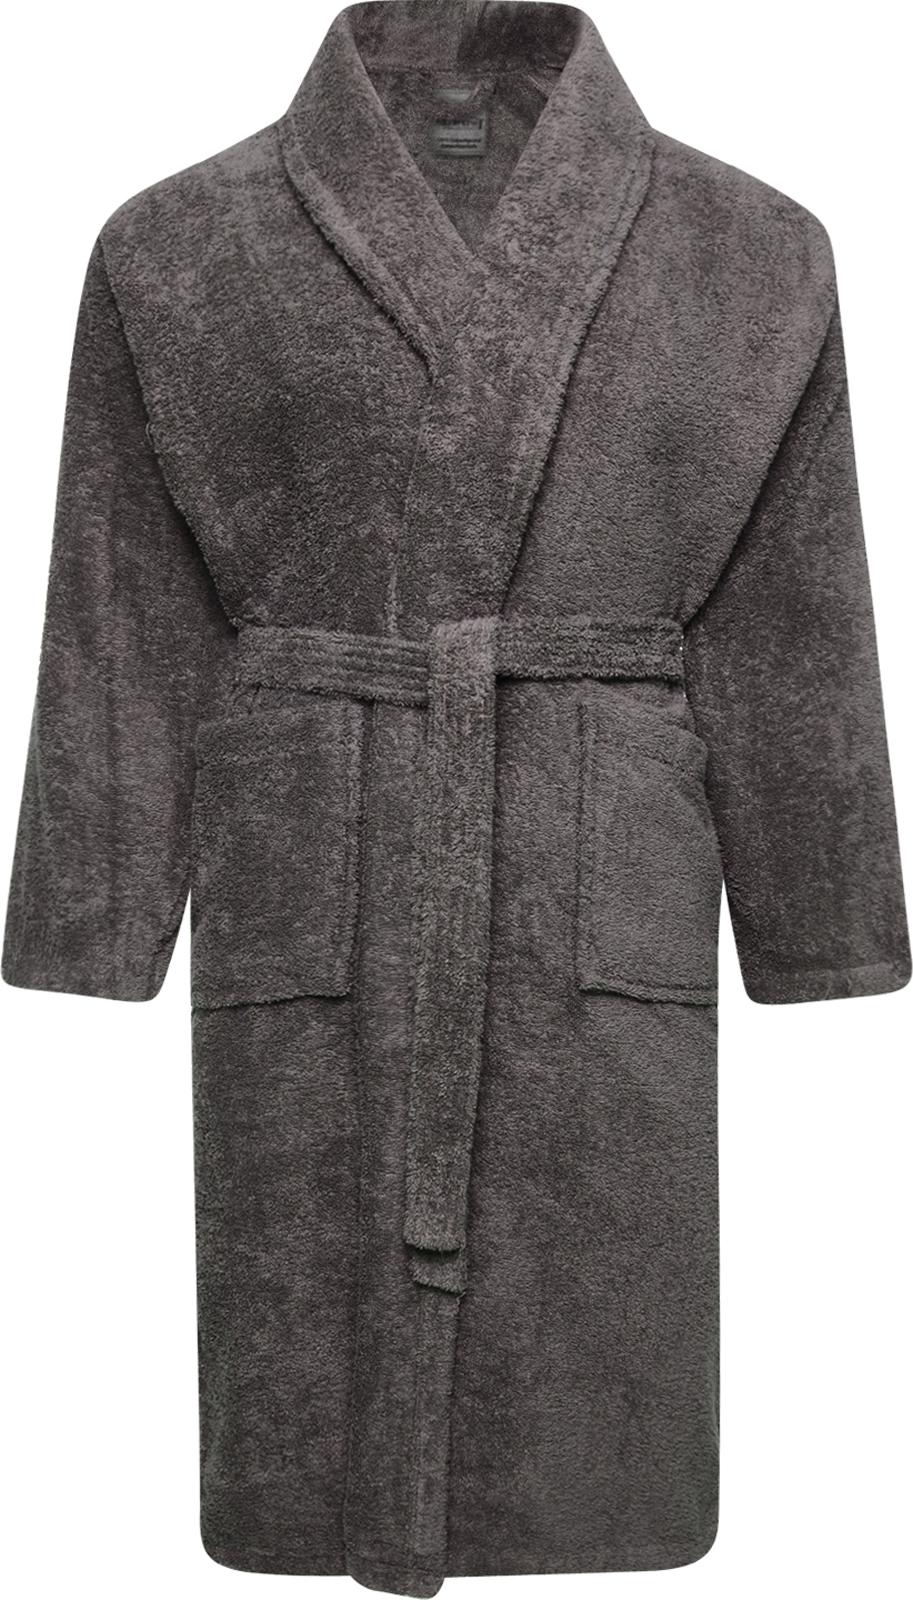 Mens Ladies 100 Cotton Terry Toweling Shawl Grey Bathrobe Dressing Gown Robe Ebay